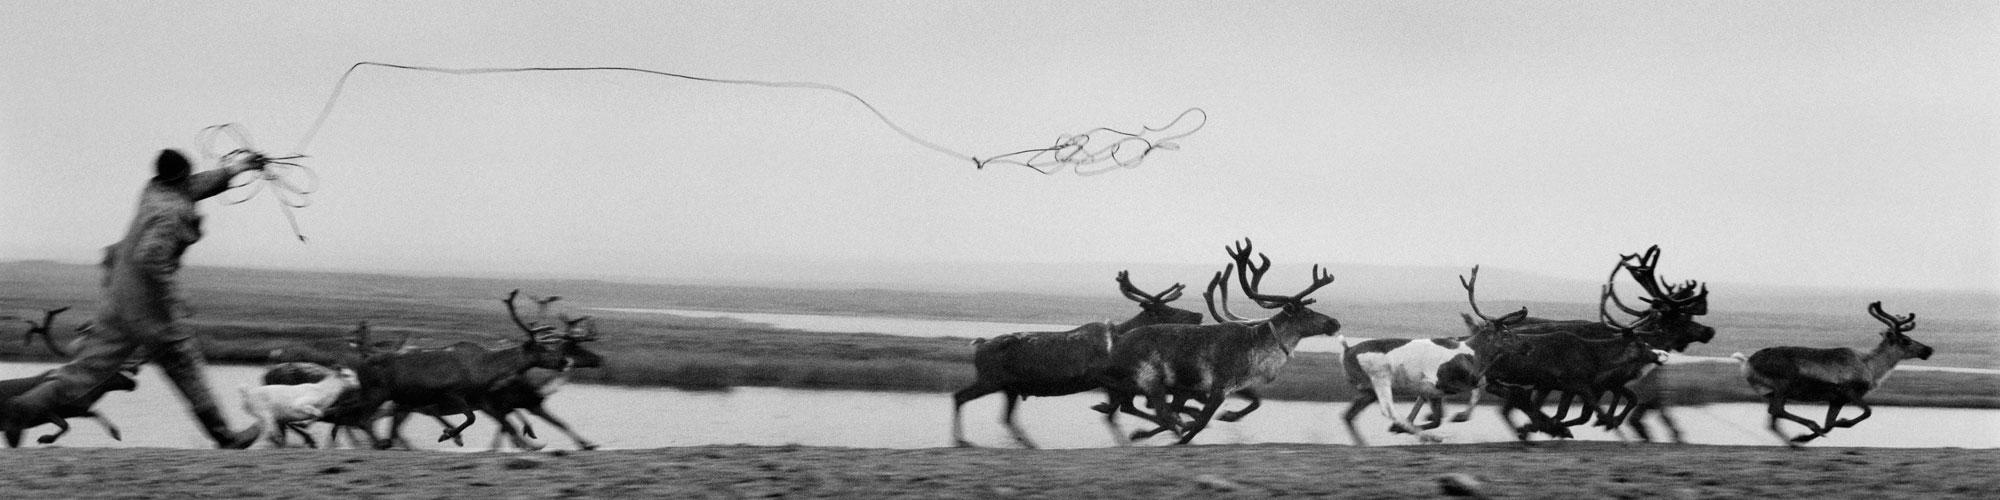 Masterclass Noord-Finland - ©Jeroen Toirkens